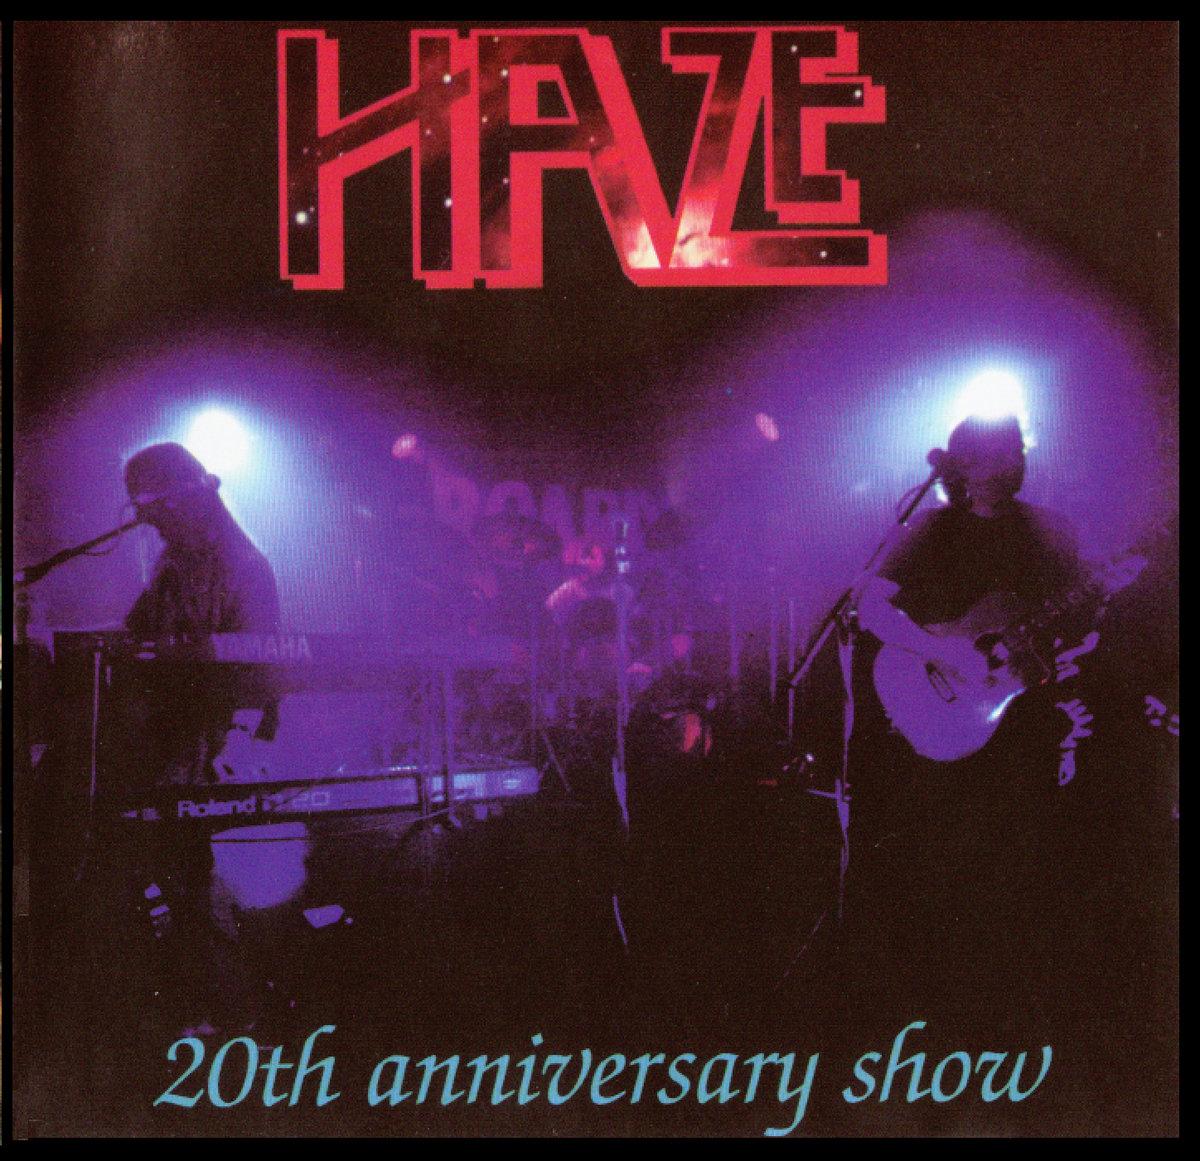 b4b024ef3 20th anniversary show. by Haze